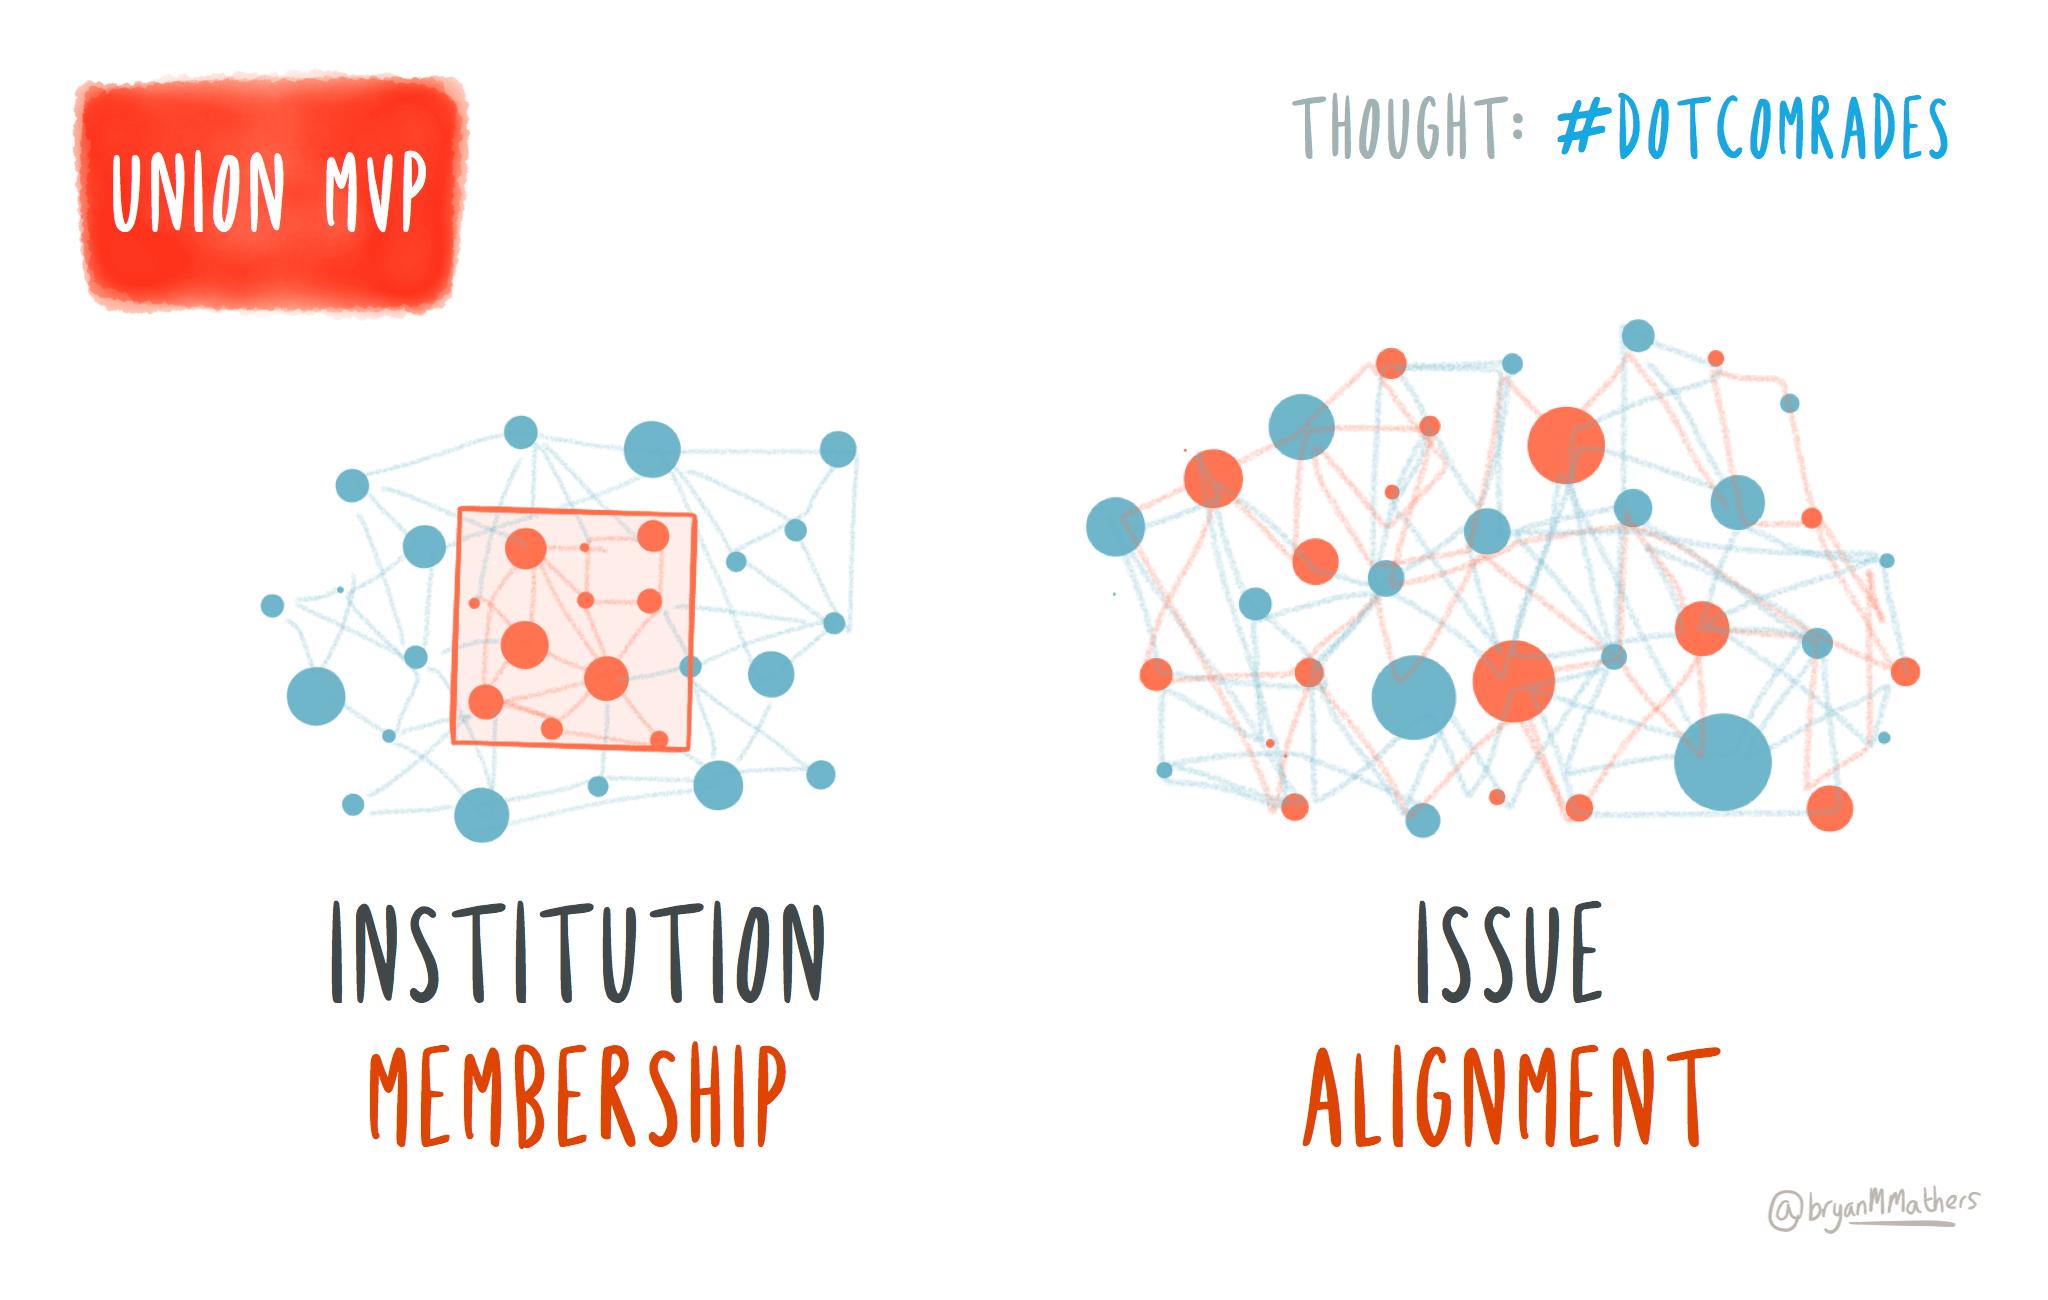 Membership vs Alignment